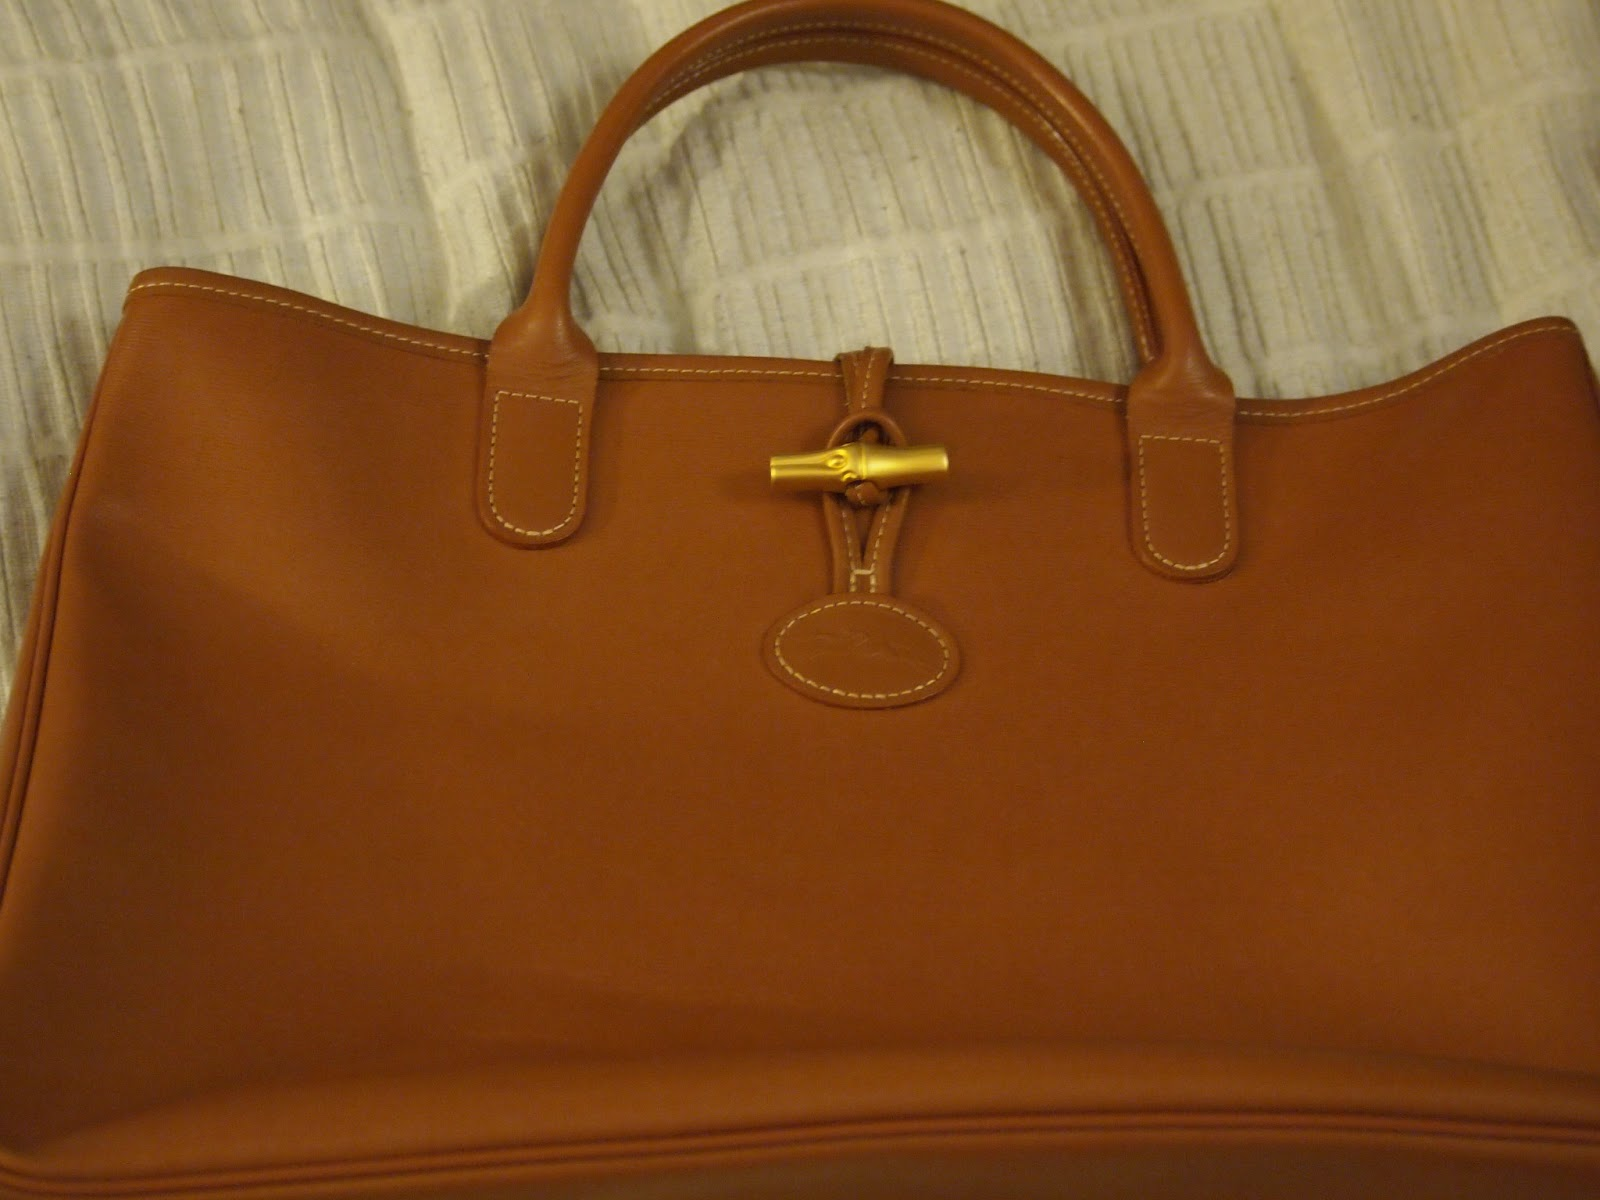 Longchamp Laukun Pesu : Xl el?m?? longchamp roseau